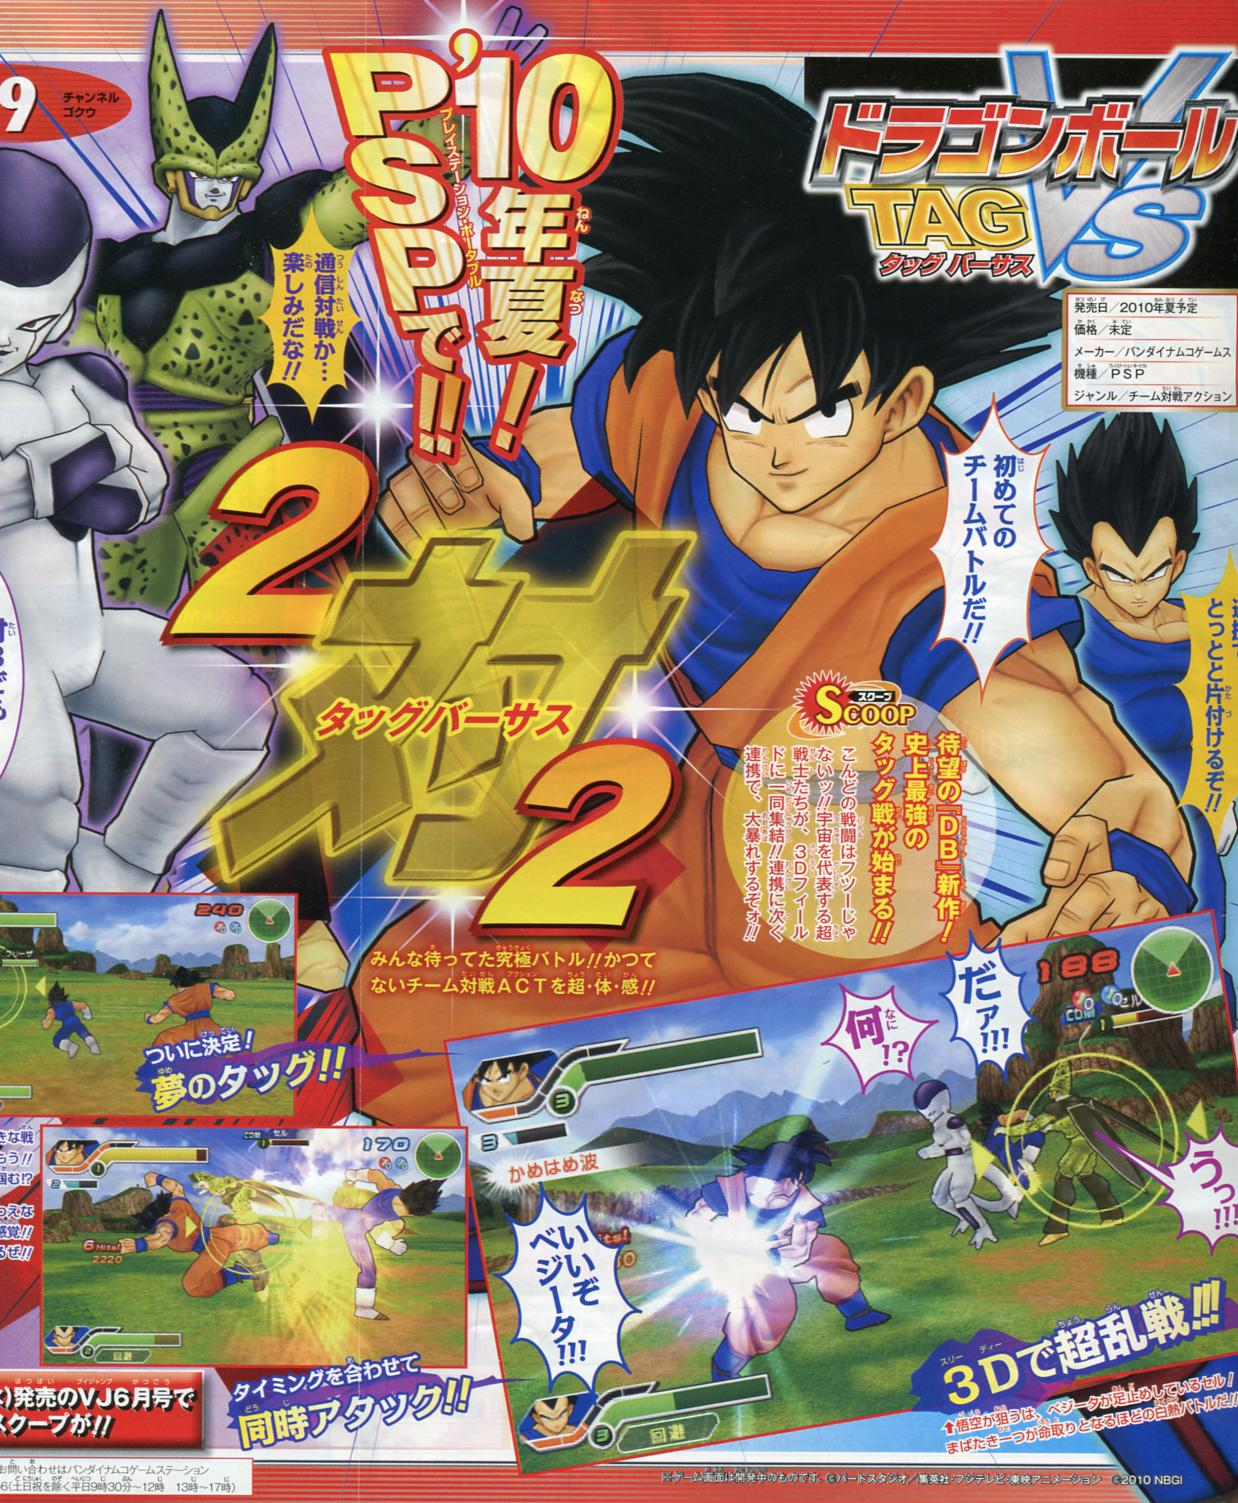 Dragon Ball Tag VS